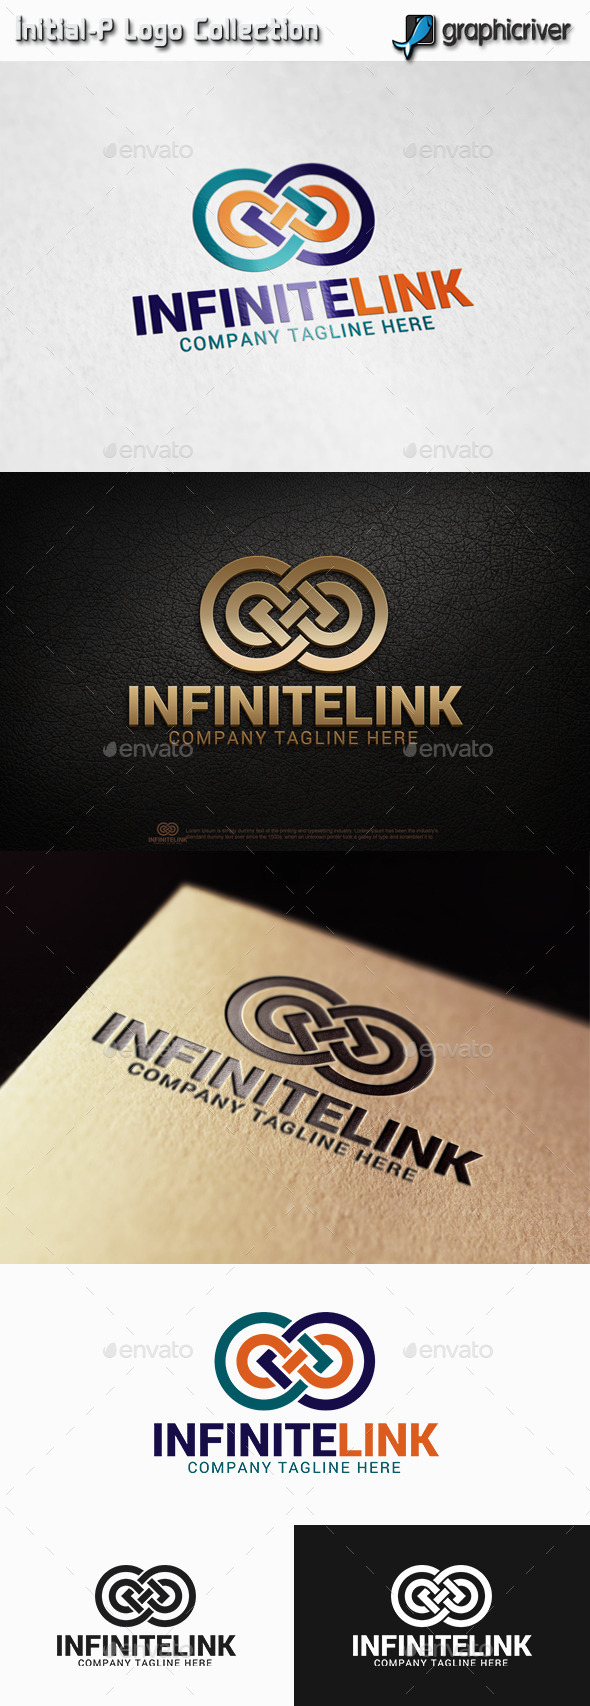 Infinite Link Infinity Logo